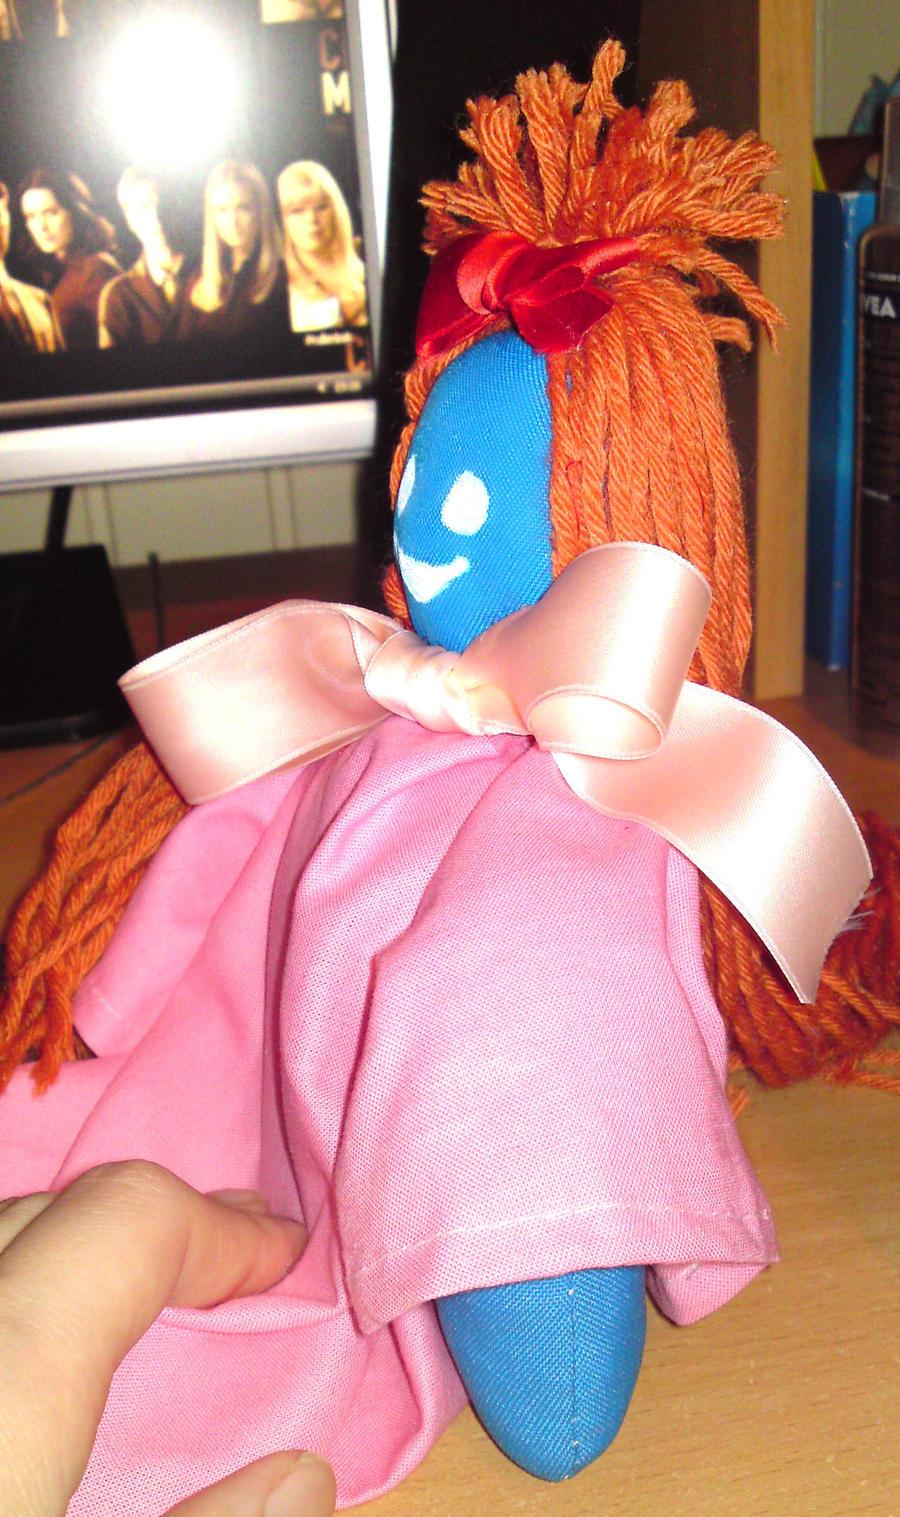 Emily doll side view by SsBrownie